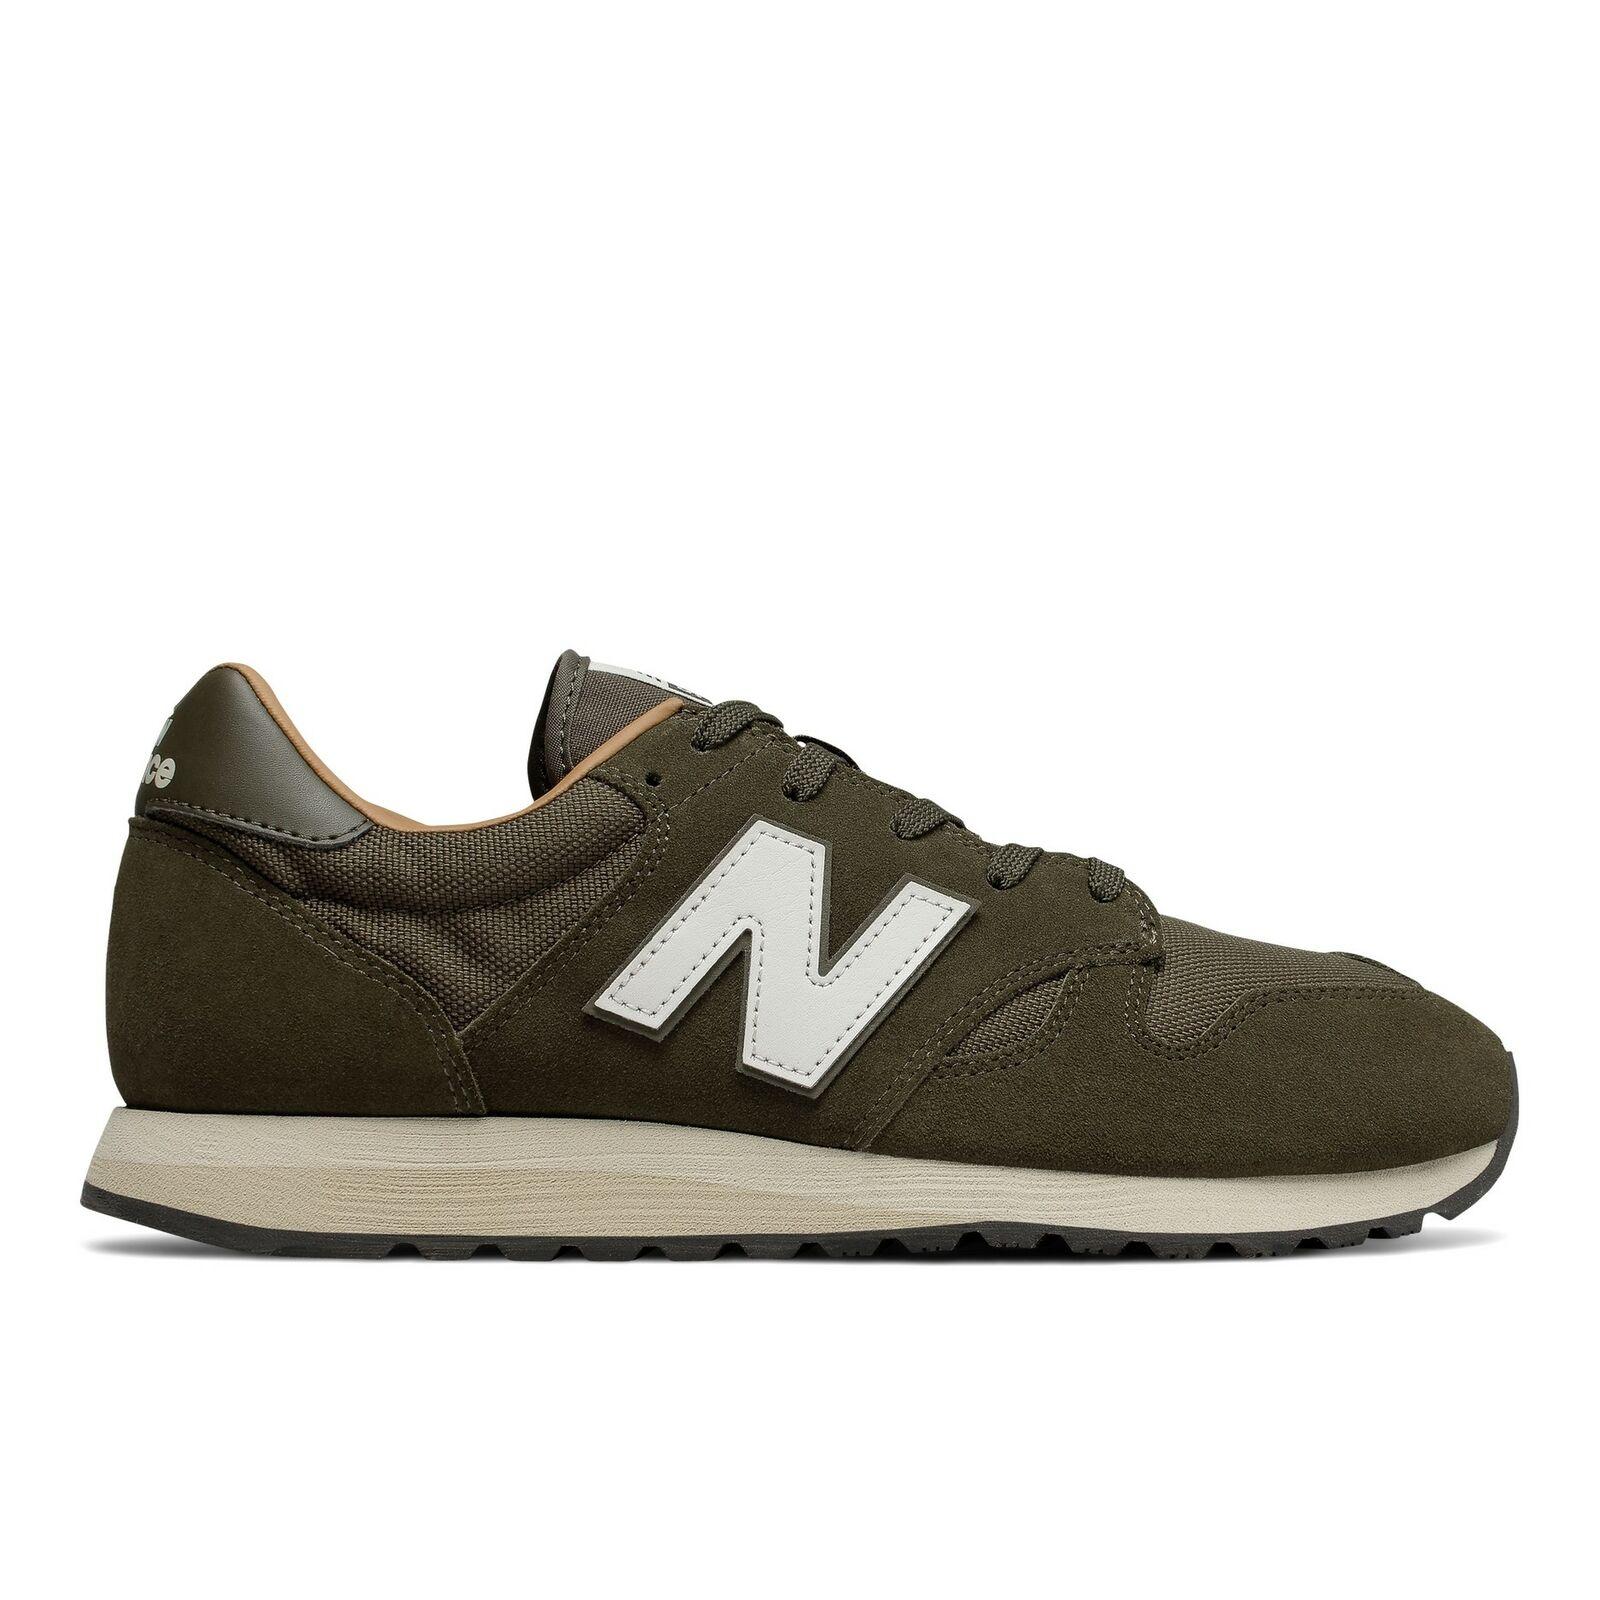 New Balance NB 520 Mens Lifestyle Lifestyle Lifestyle Sneakers shoes Green Khaki with White U520-BG 71fd72